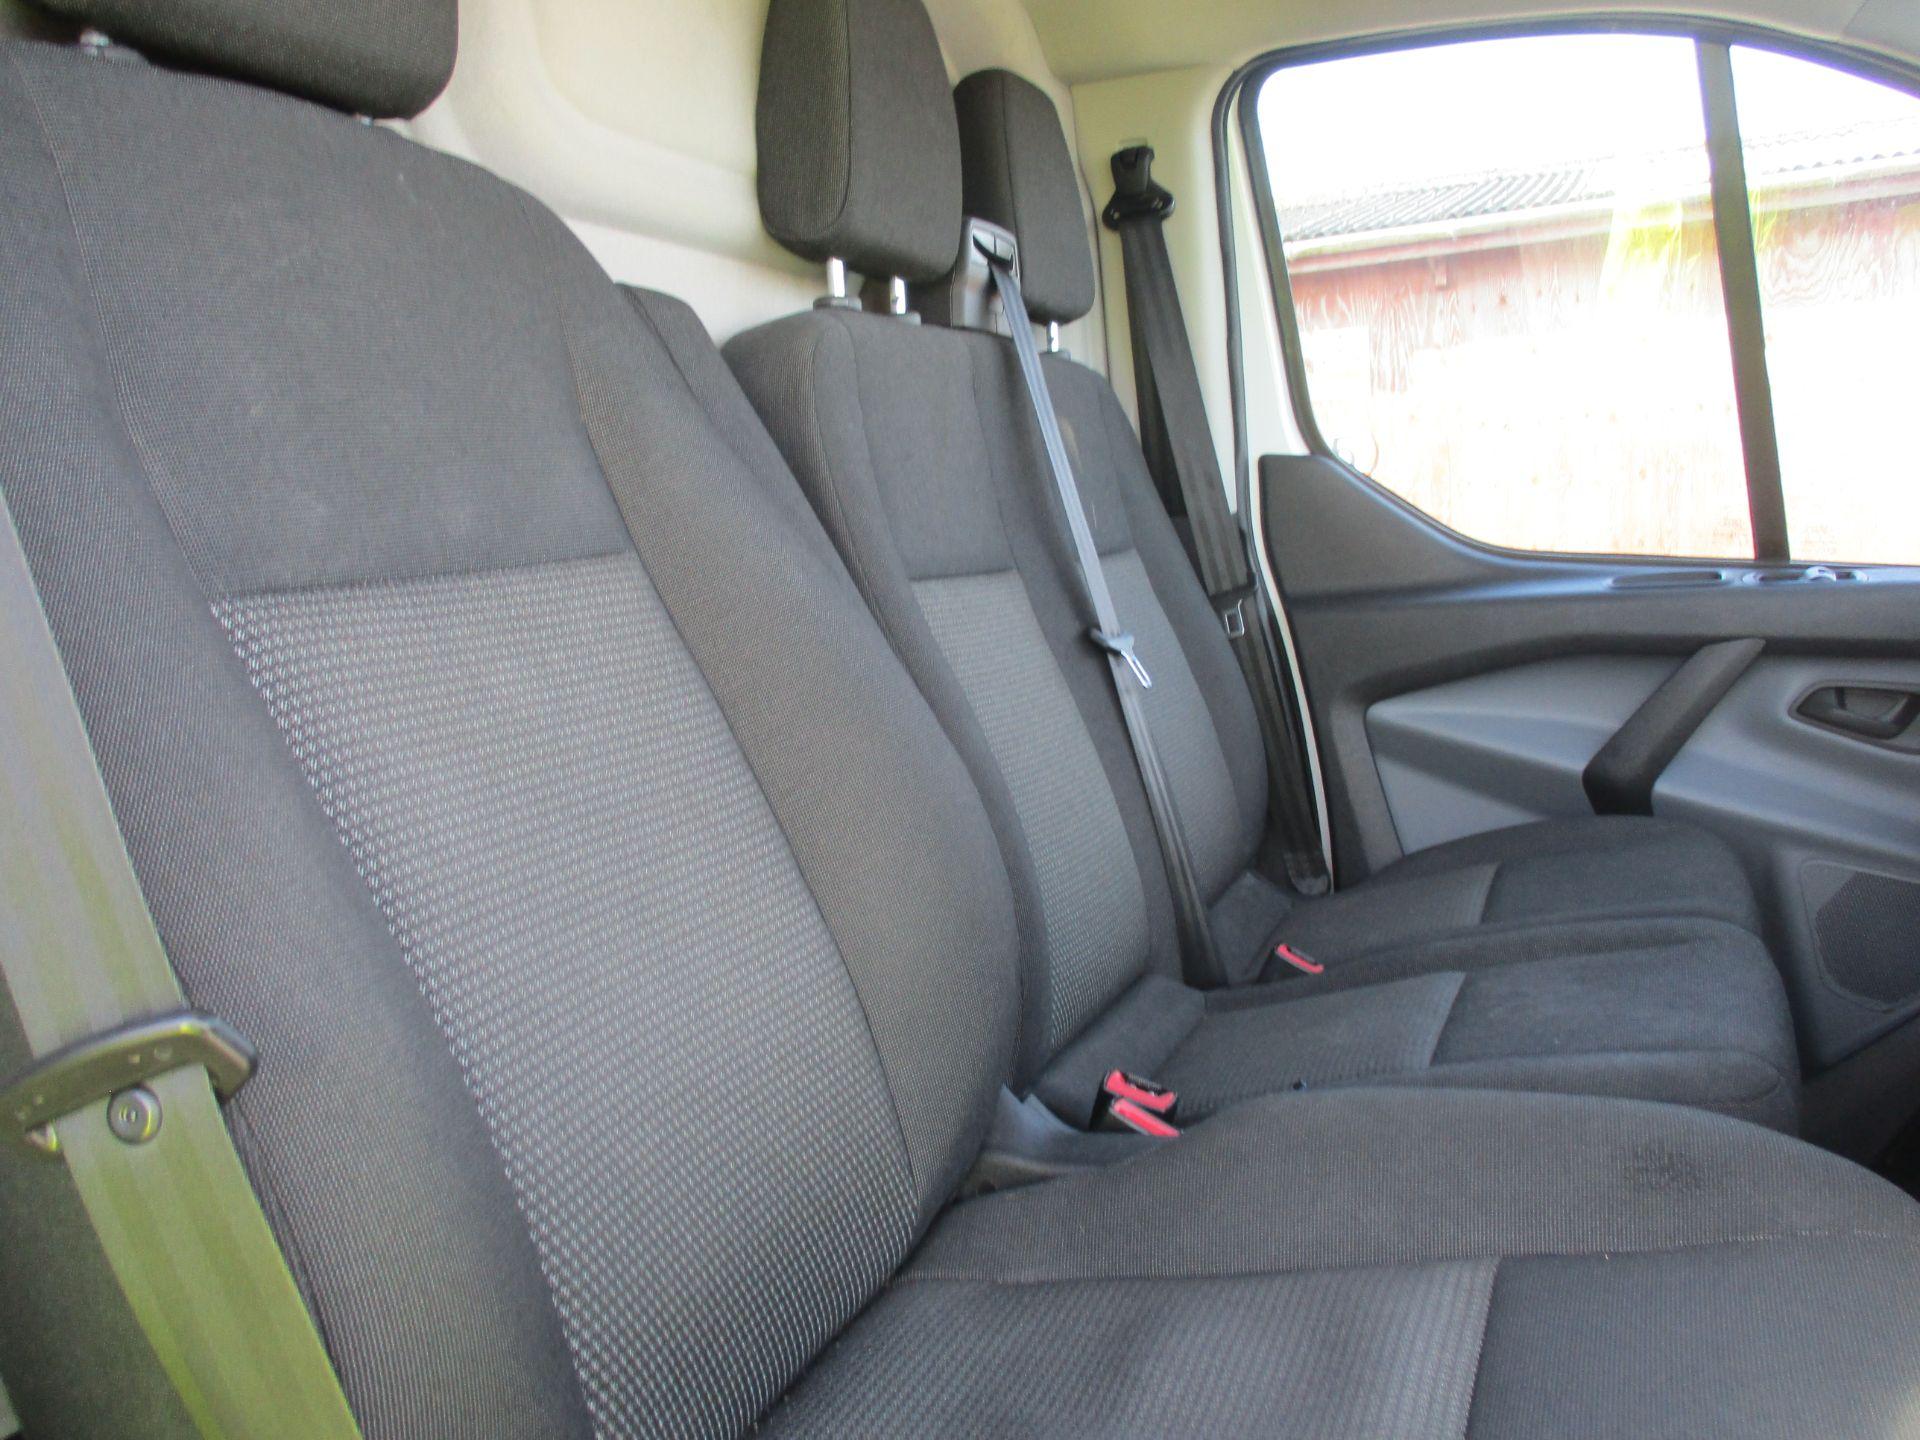 2017 Ford Transit Custom 290 L1 DIESEL FWD 2.0 TDCI 105PS LOW ROOF VAN EURO 6 (FL67RWZ) Image 12